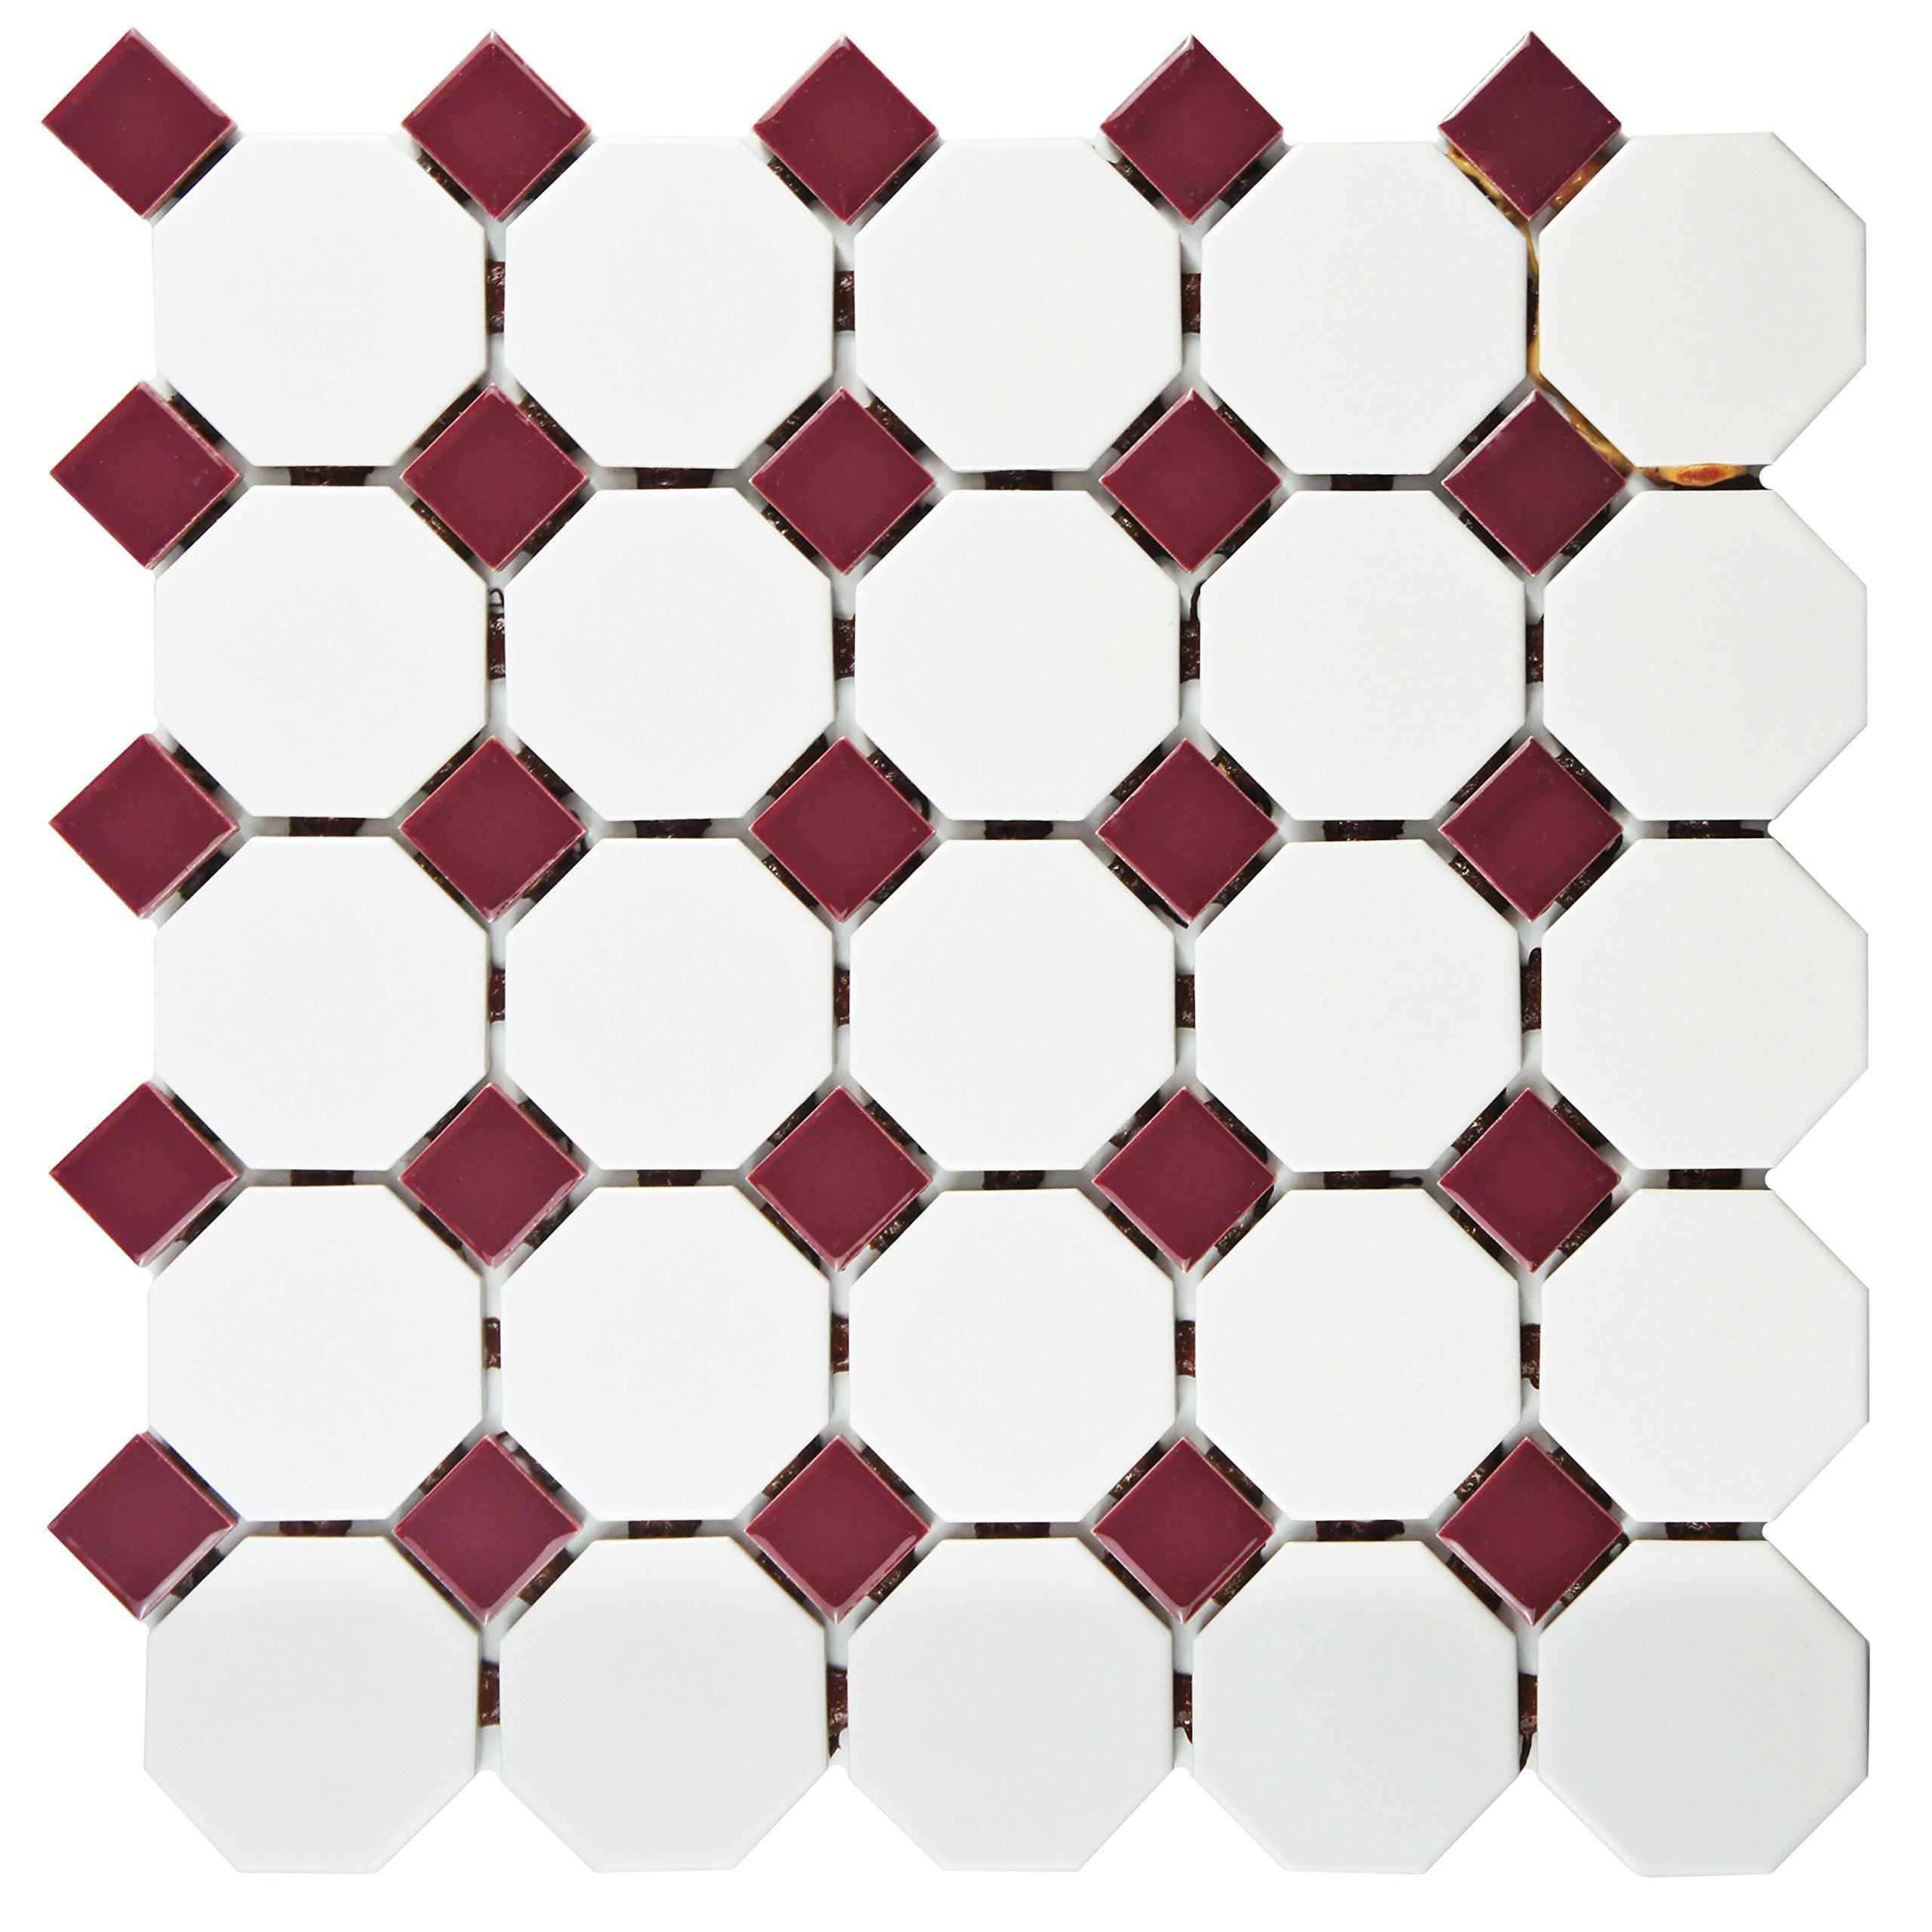 SomerTile FXLMOWBU Retro Octagon Porcelain Floor and Wall Tile, 11.5'' x 11.5'', Matte White with Burgundy Dot